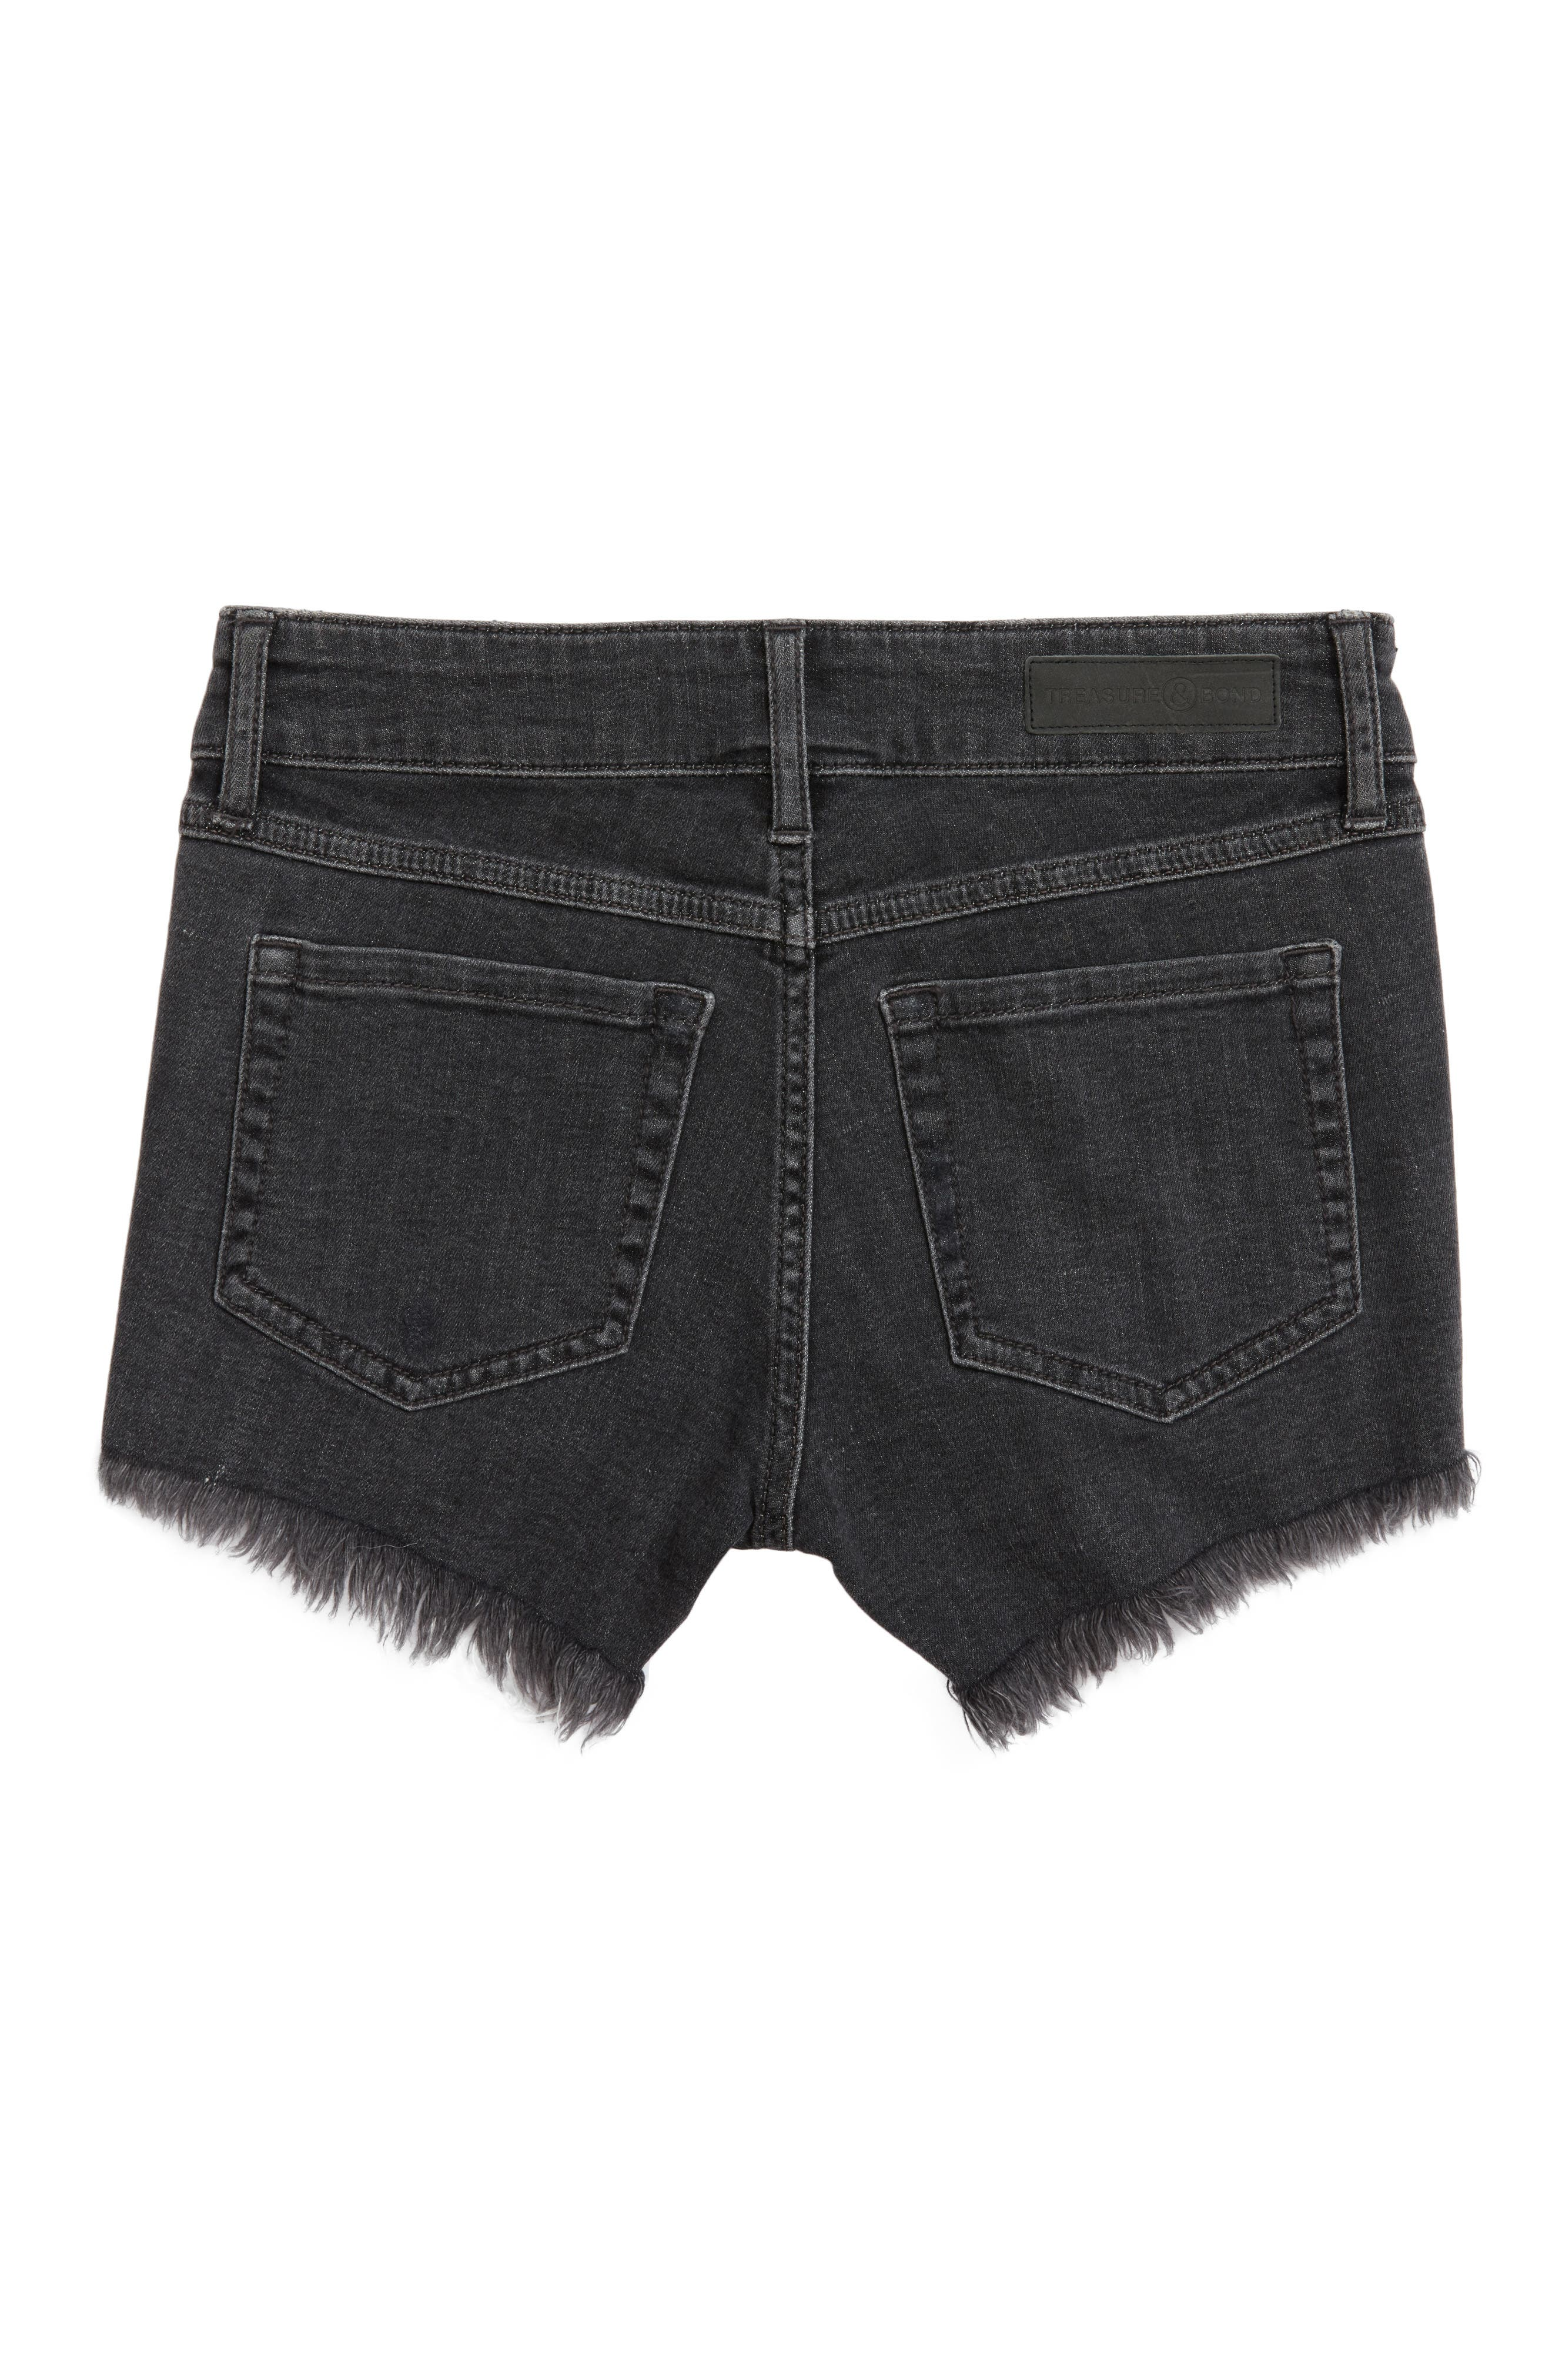 TREASURE & BOND, Distressed Cutoff Denim Shorts, Alternate thumbnail 2, color, BLACK VINTAGE WASH